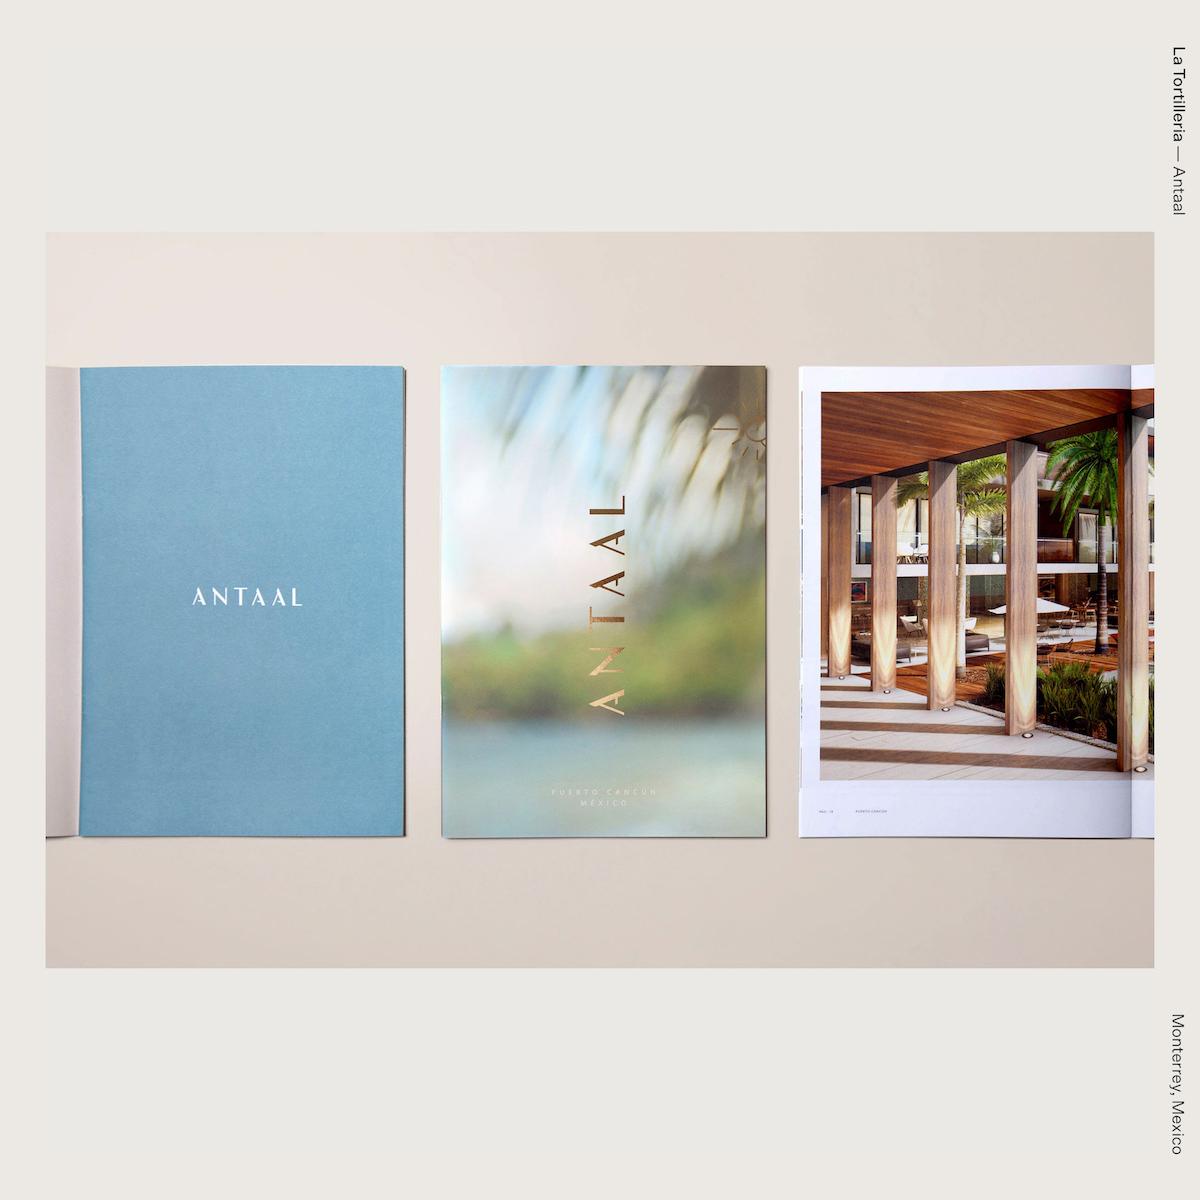 La Tortilleria — Antaal